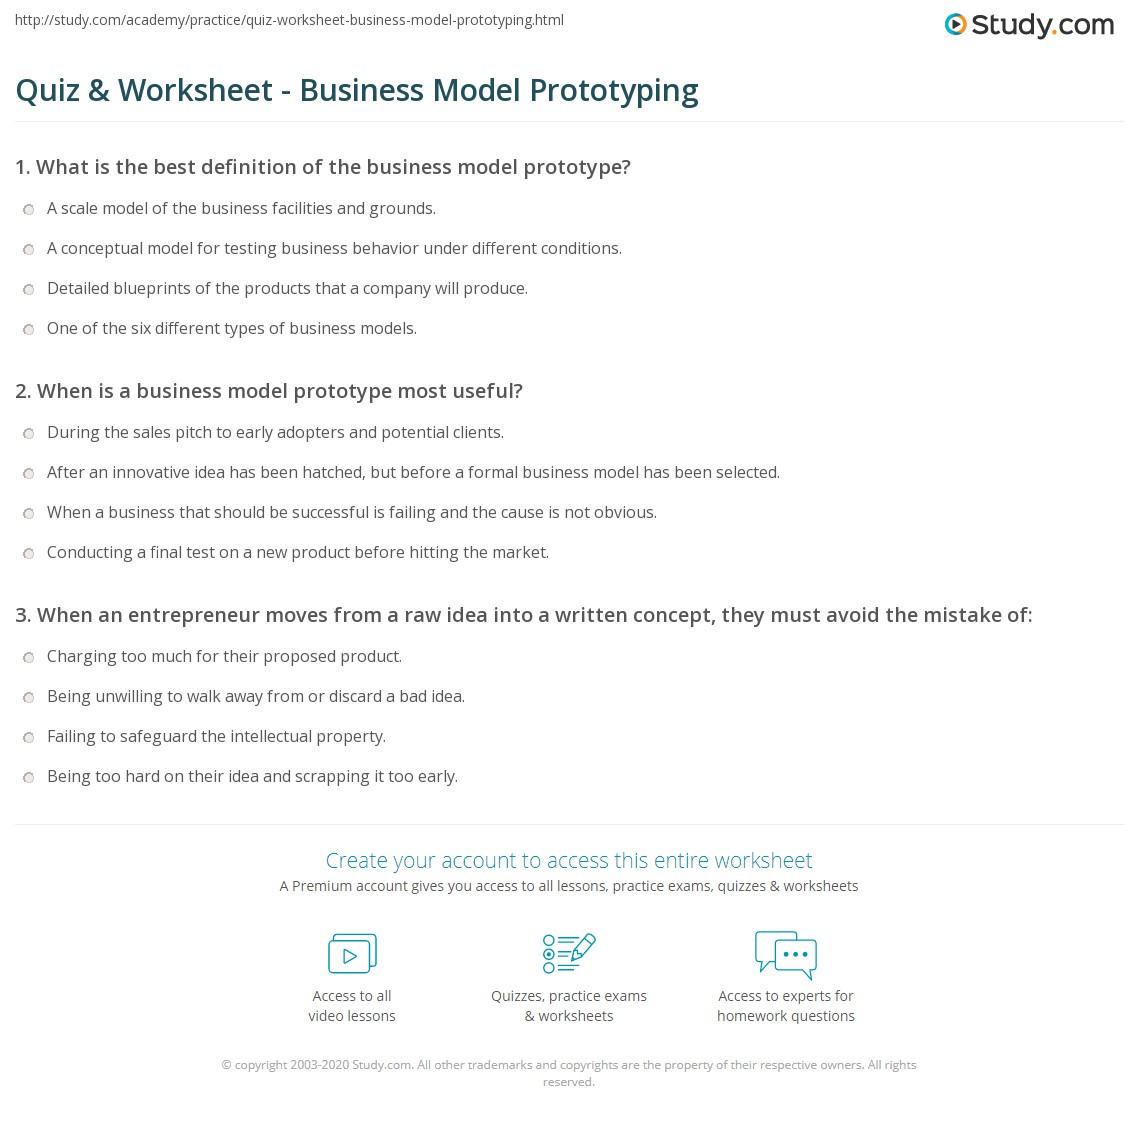 Quiz & Worksheet - Business Model Prototyping | Study.com